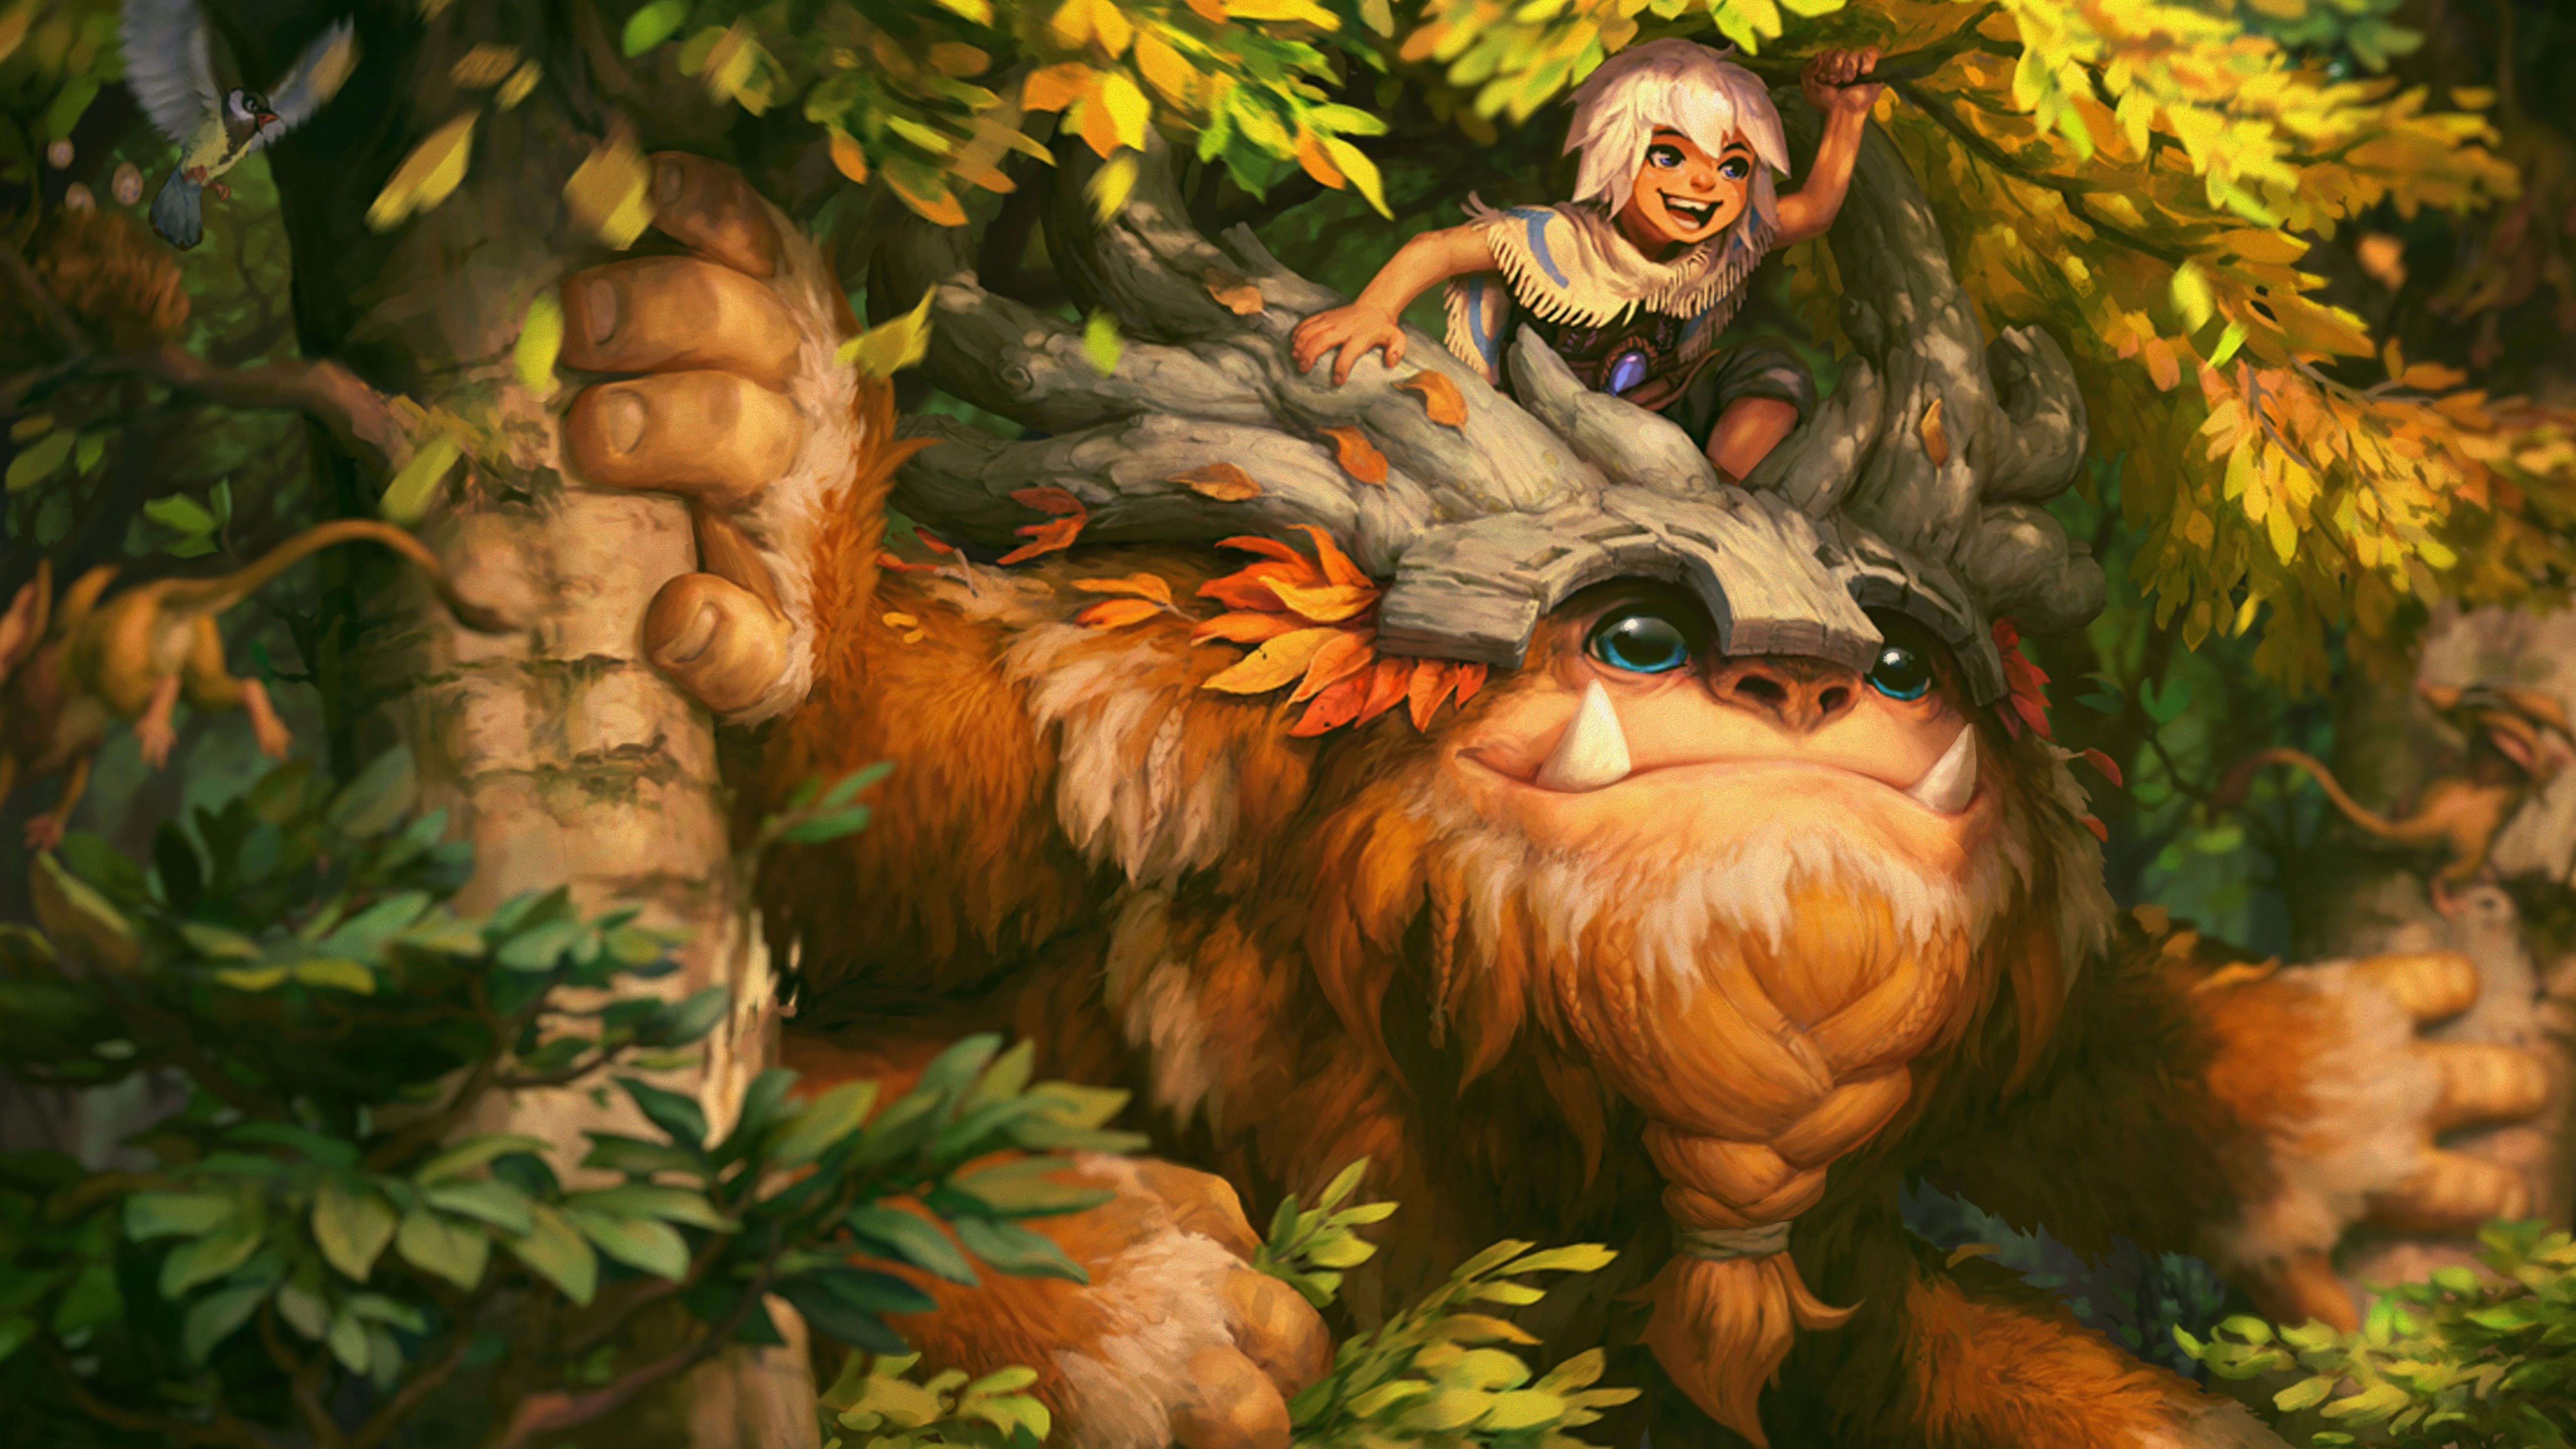 Sasquatch Nunu New Splash Art Rework Update Lol League Of Legends Lol Nunu League Of Lege League Of Legends Lol League Of Legends League Of Legends Characters